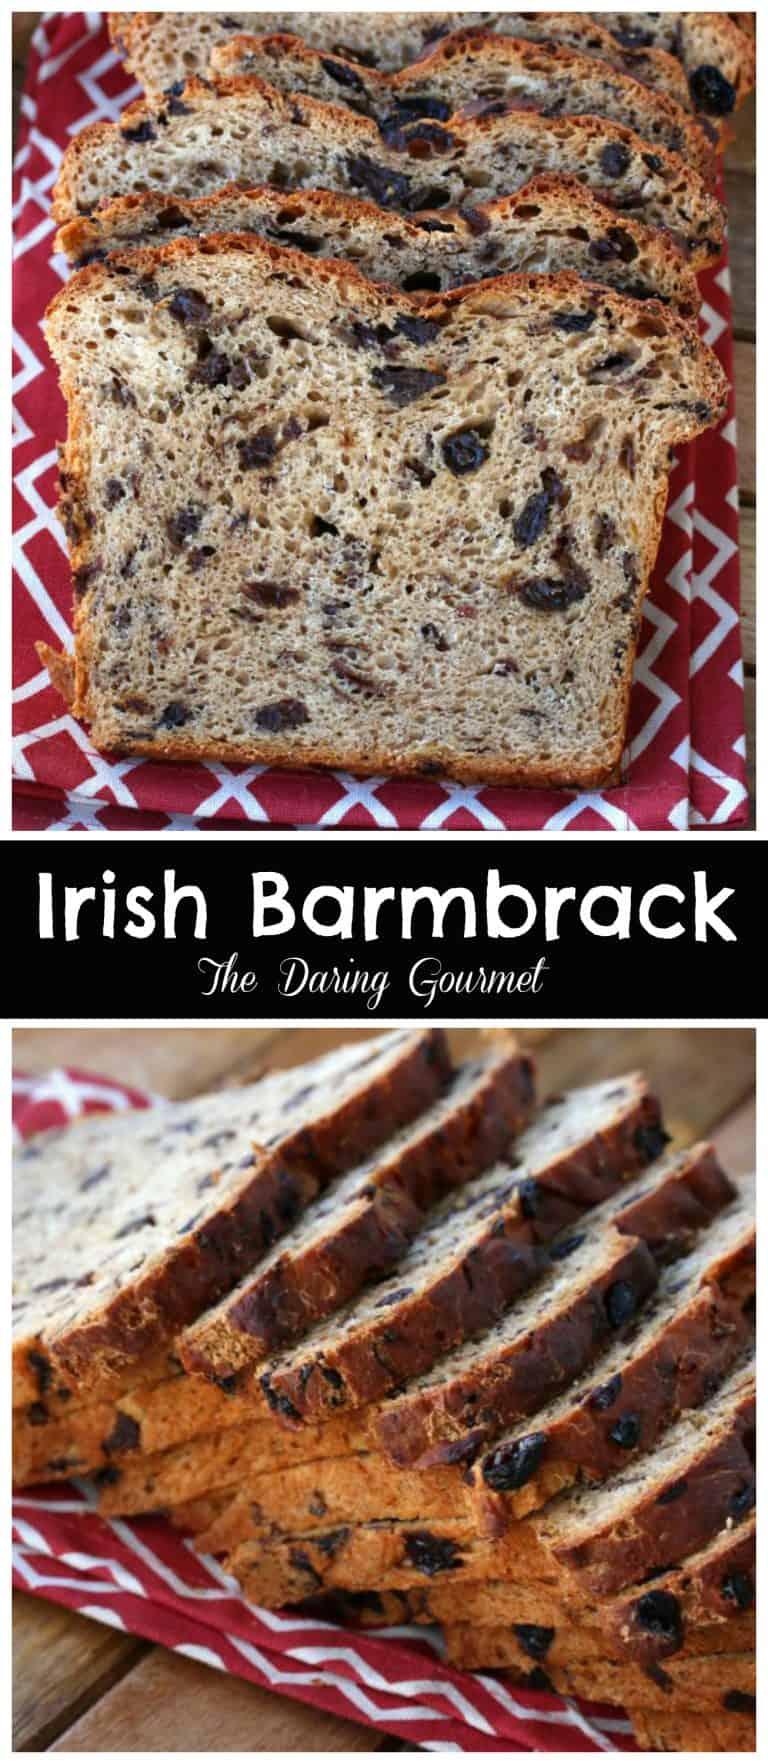 Irish Barmbrack (Báirín Breac) - The Daring Gourmet